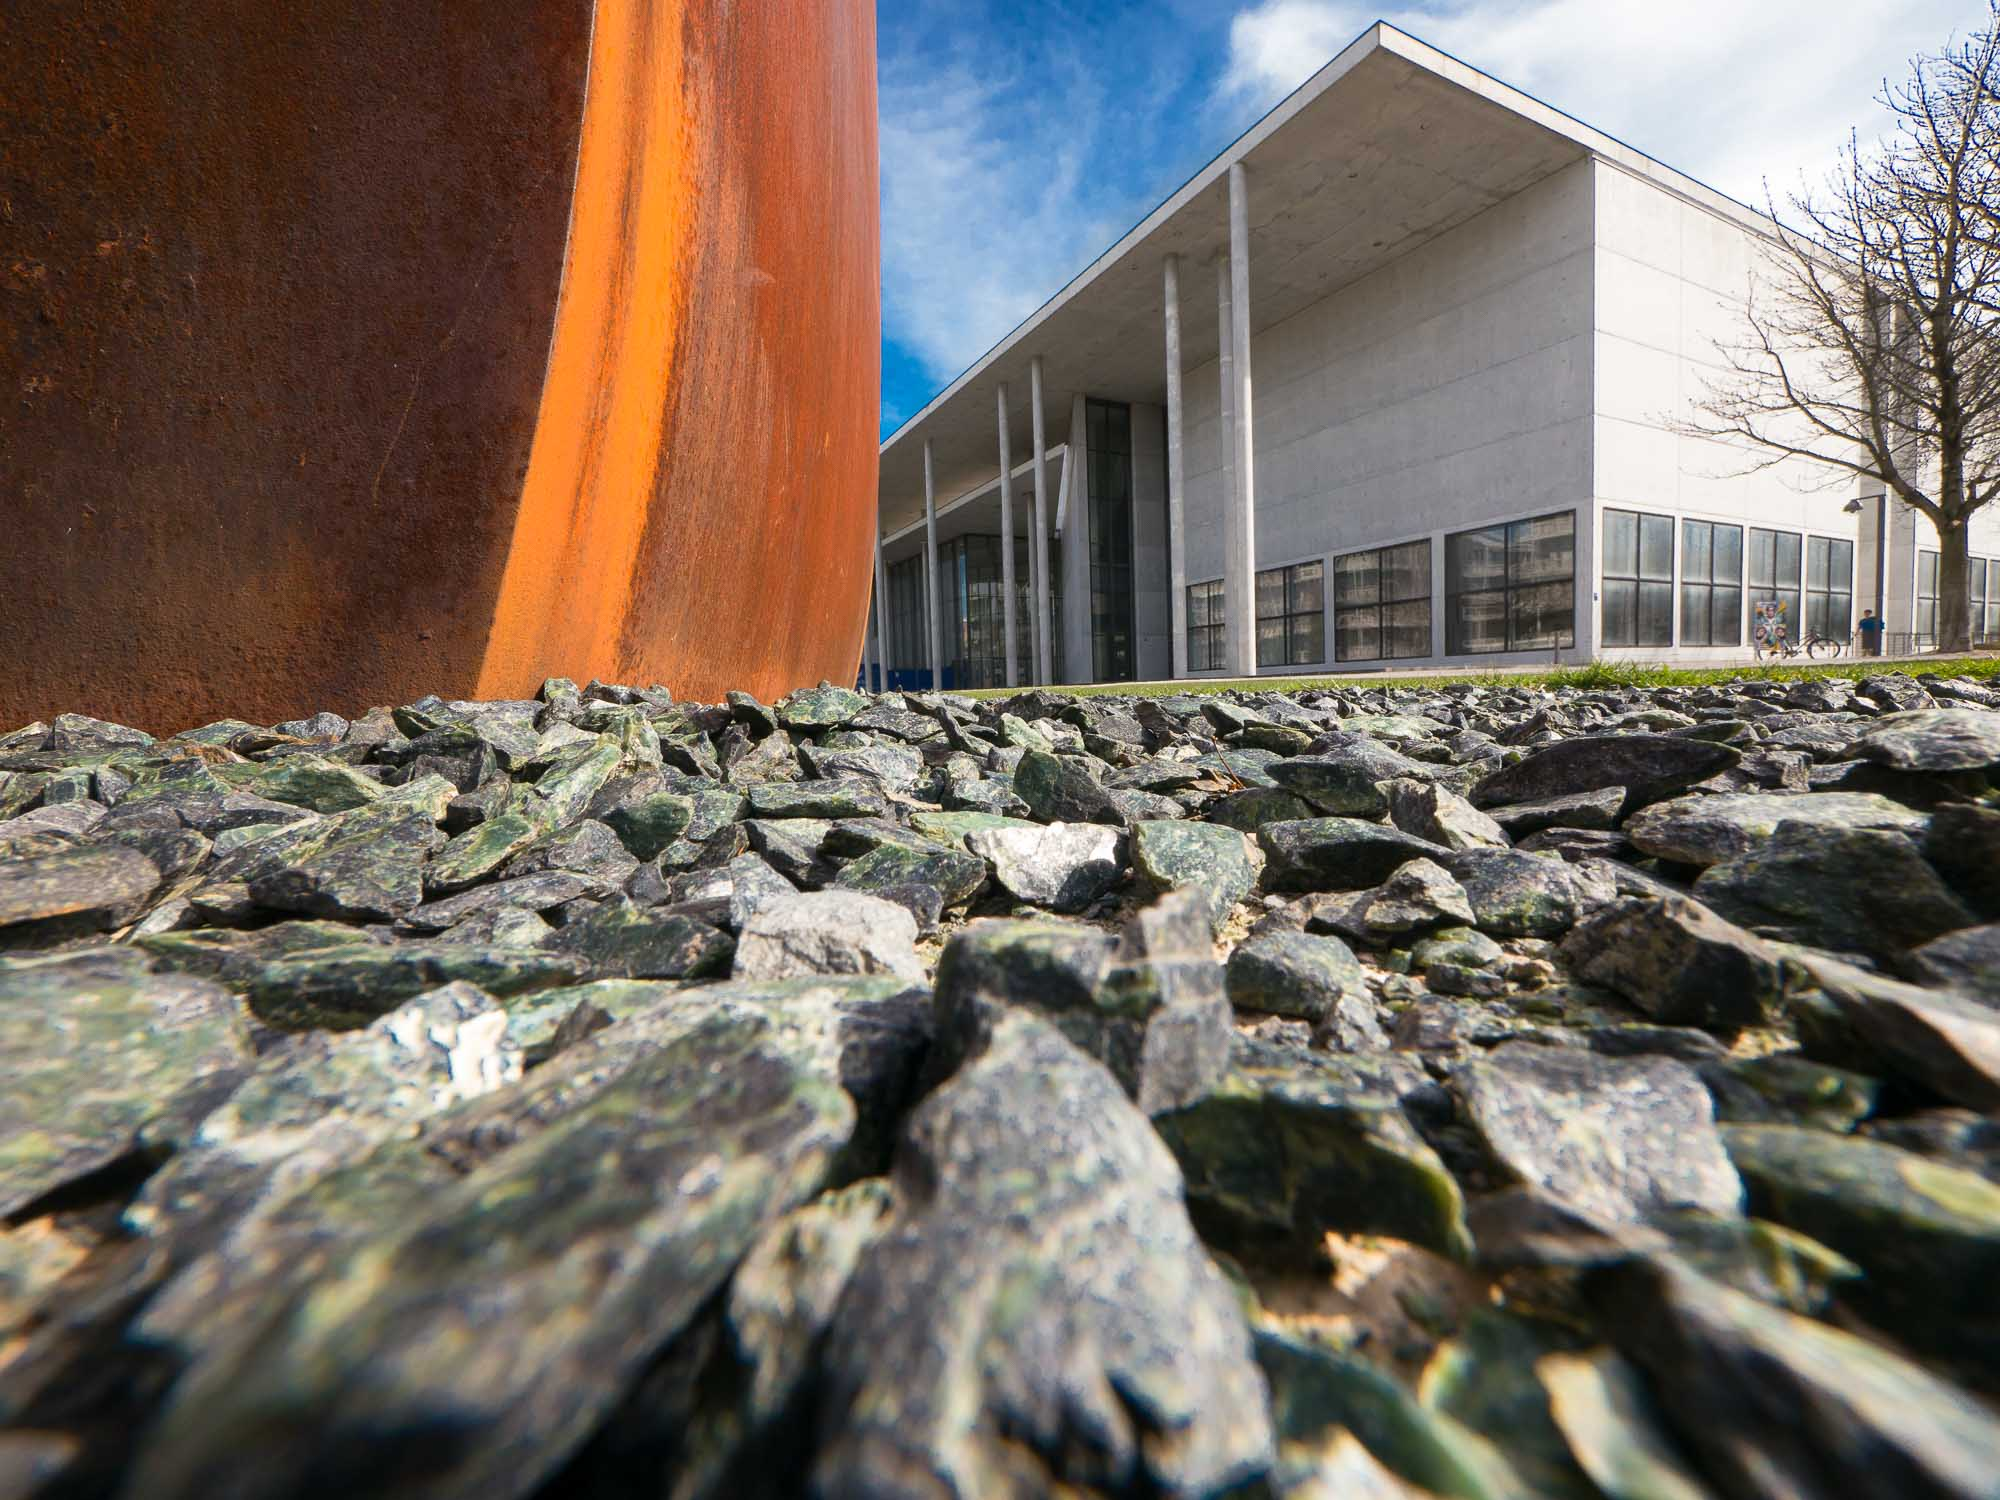 wp-Galerie-Architektur-019